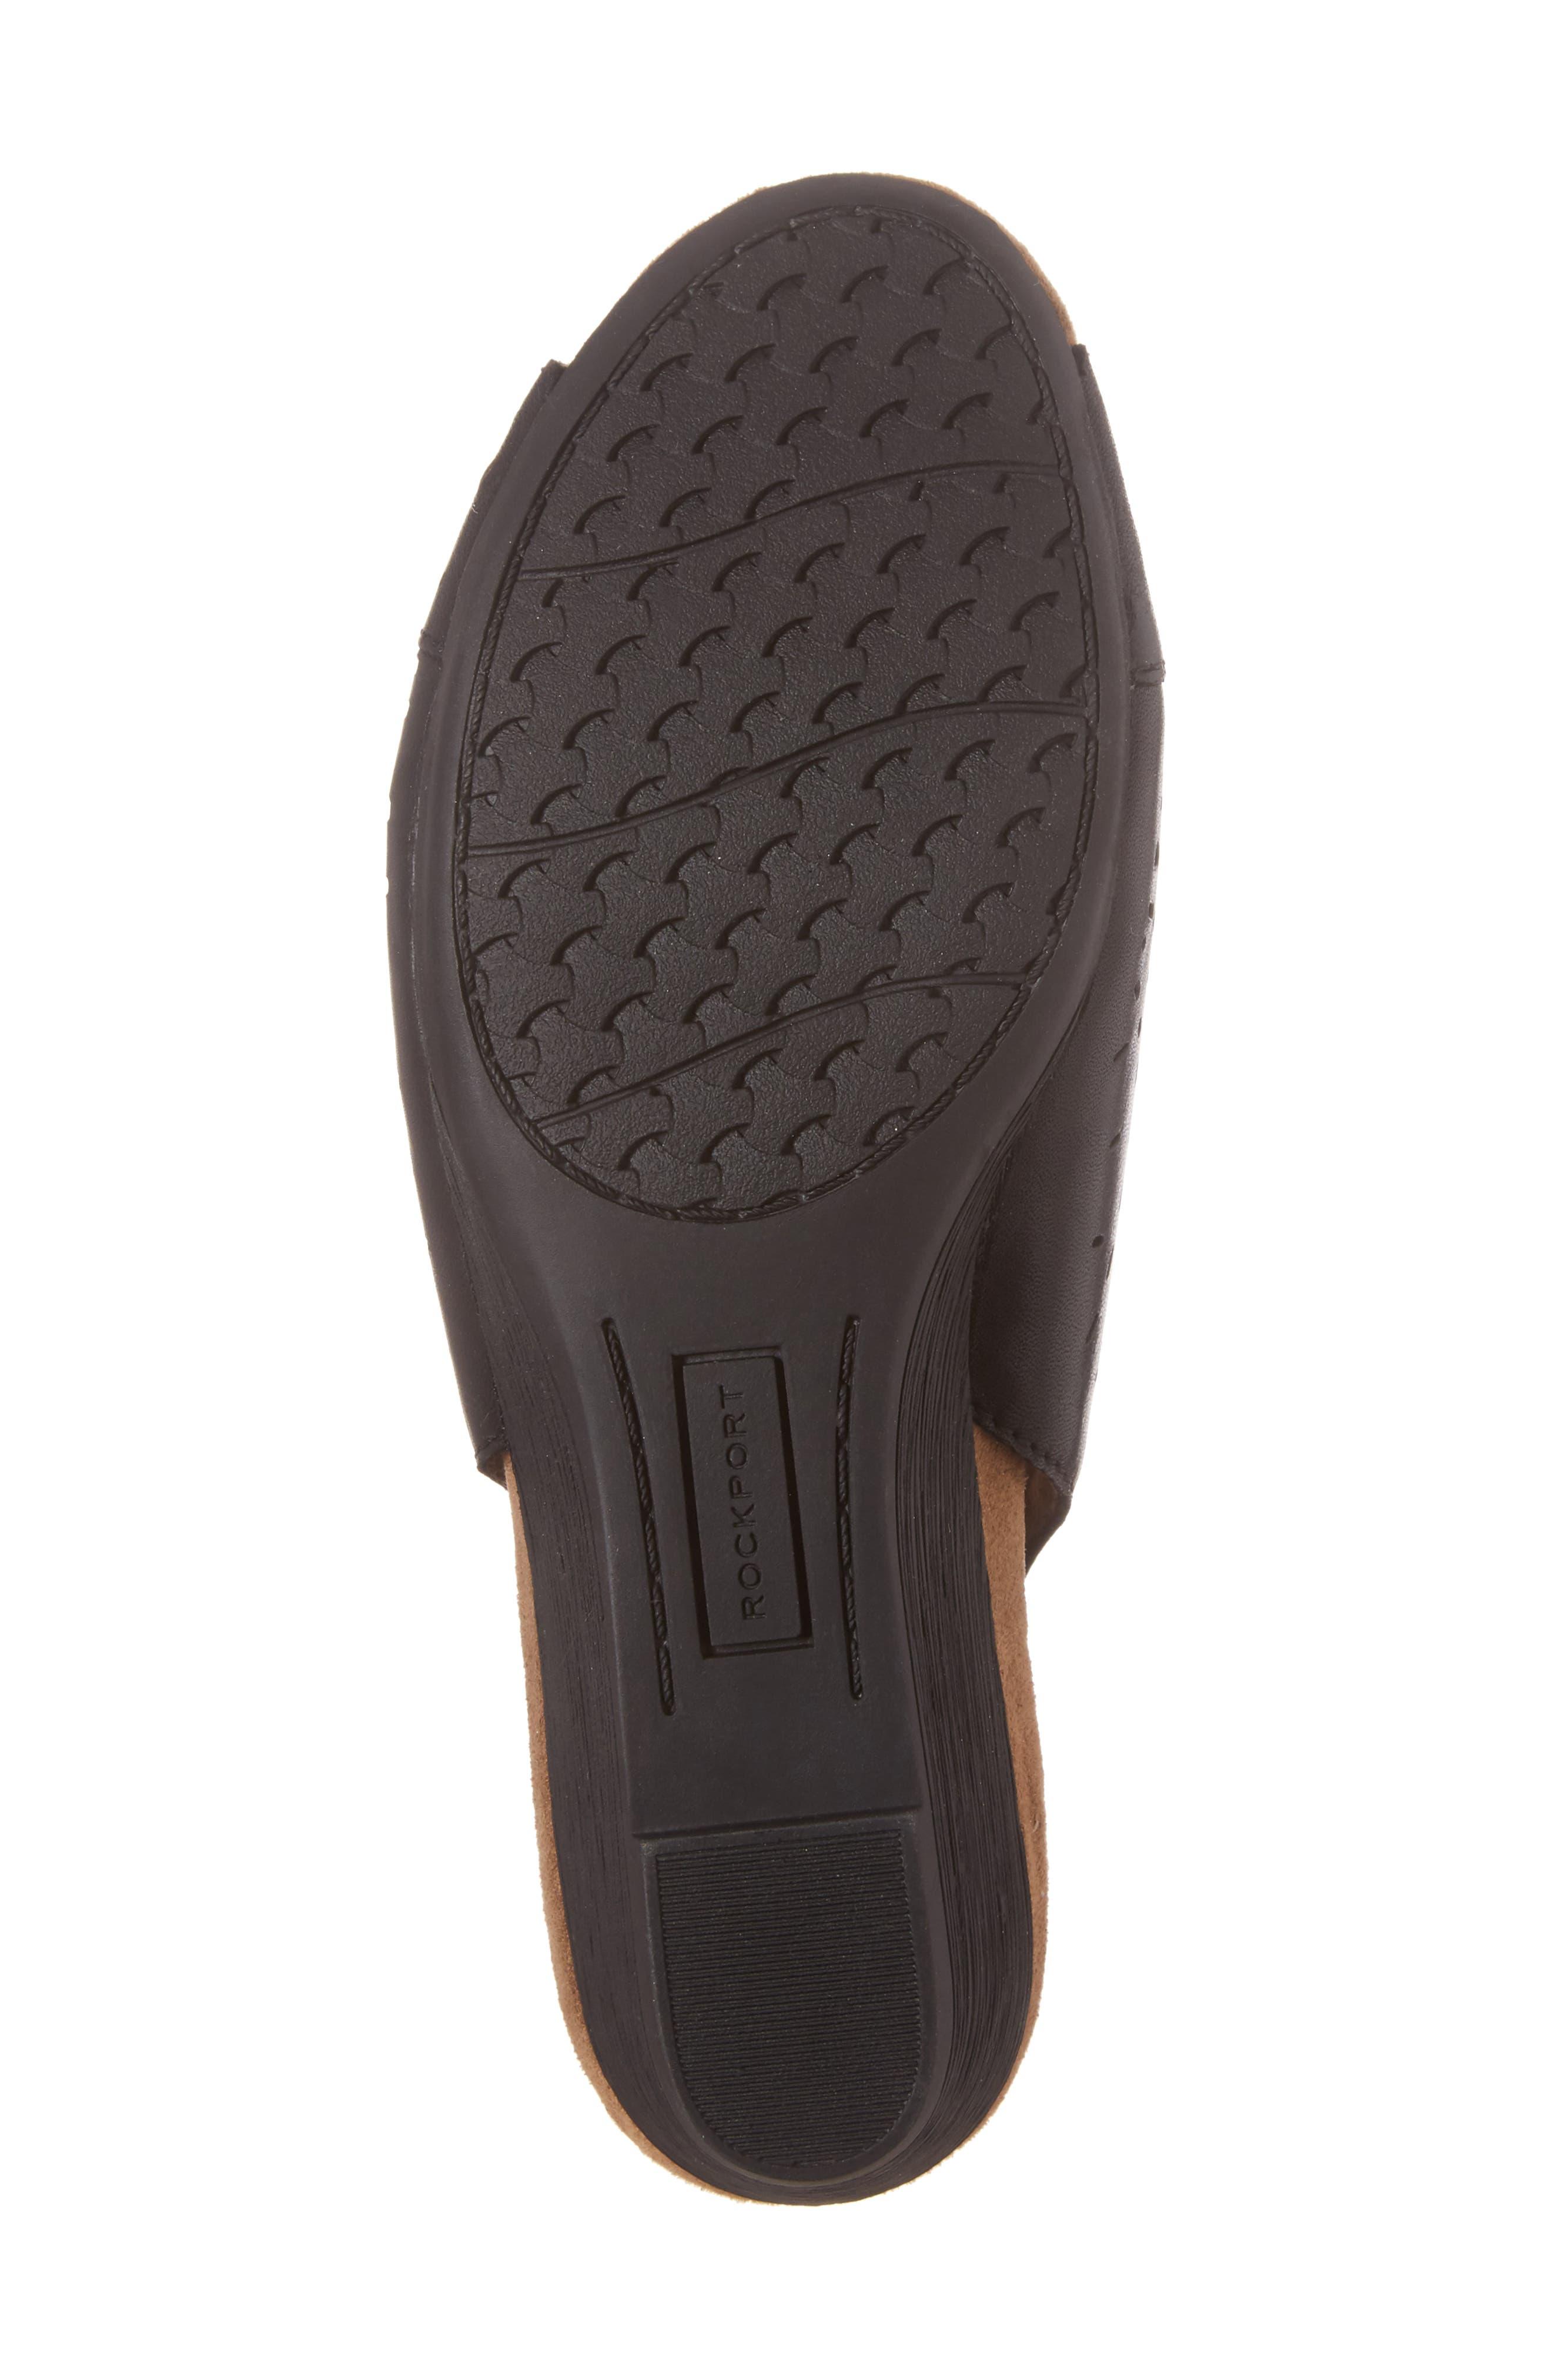 Judson Slingback Wedge Sandal,                             Alternate thumbnail 6, color,                             BLACK LEATHER